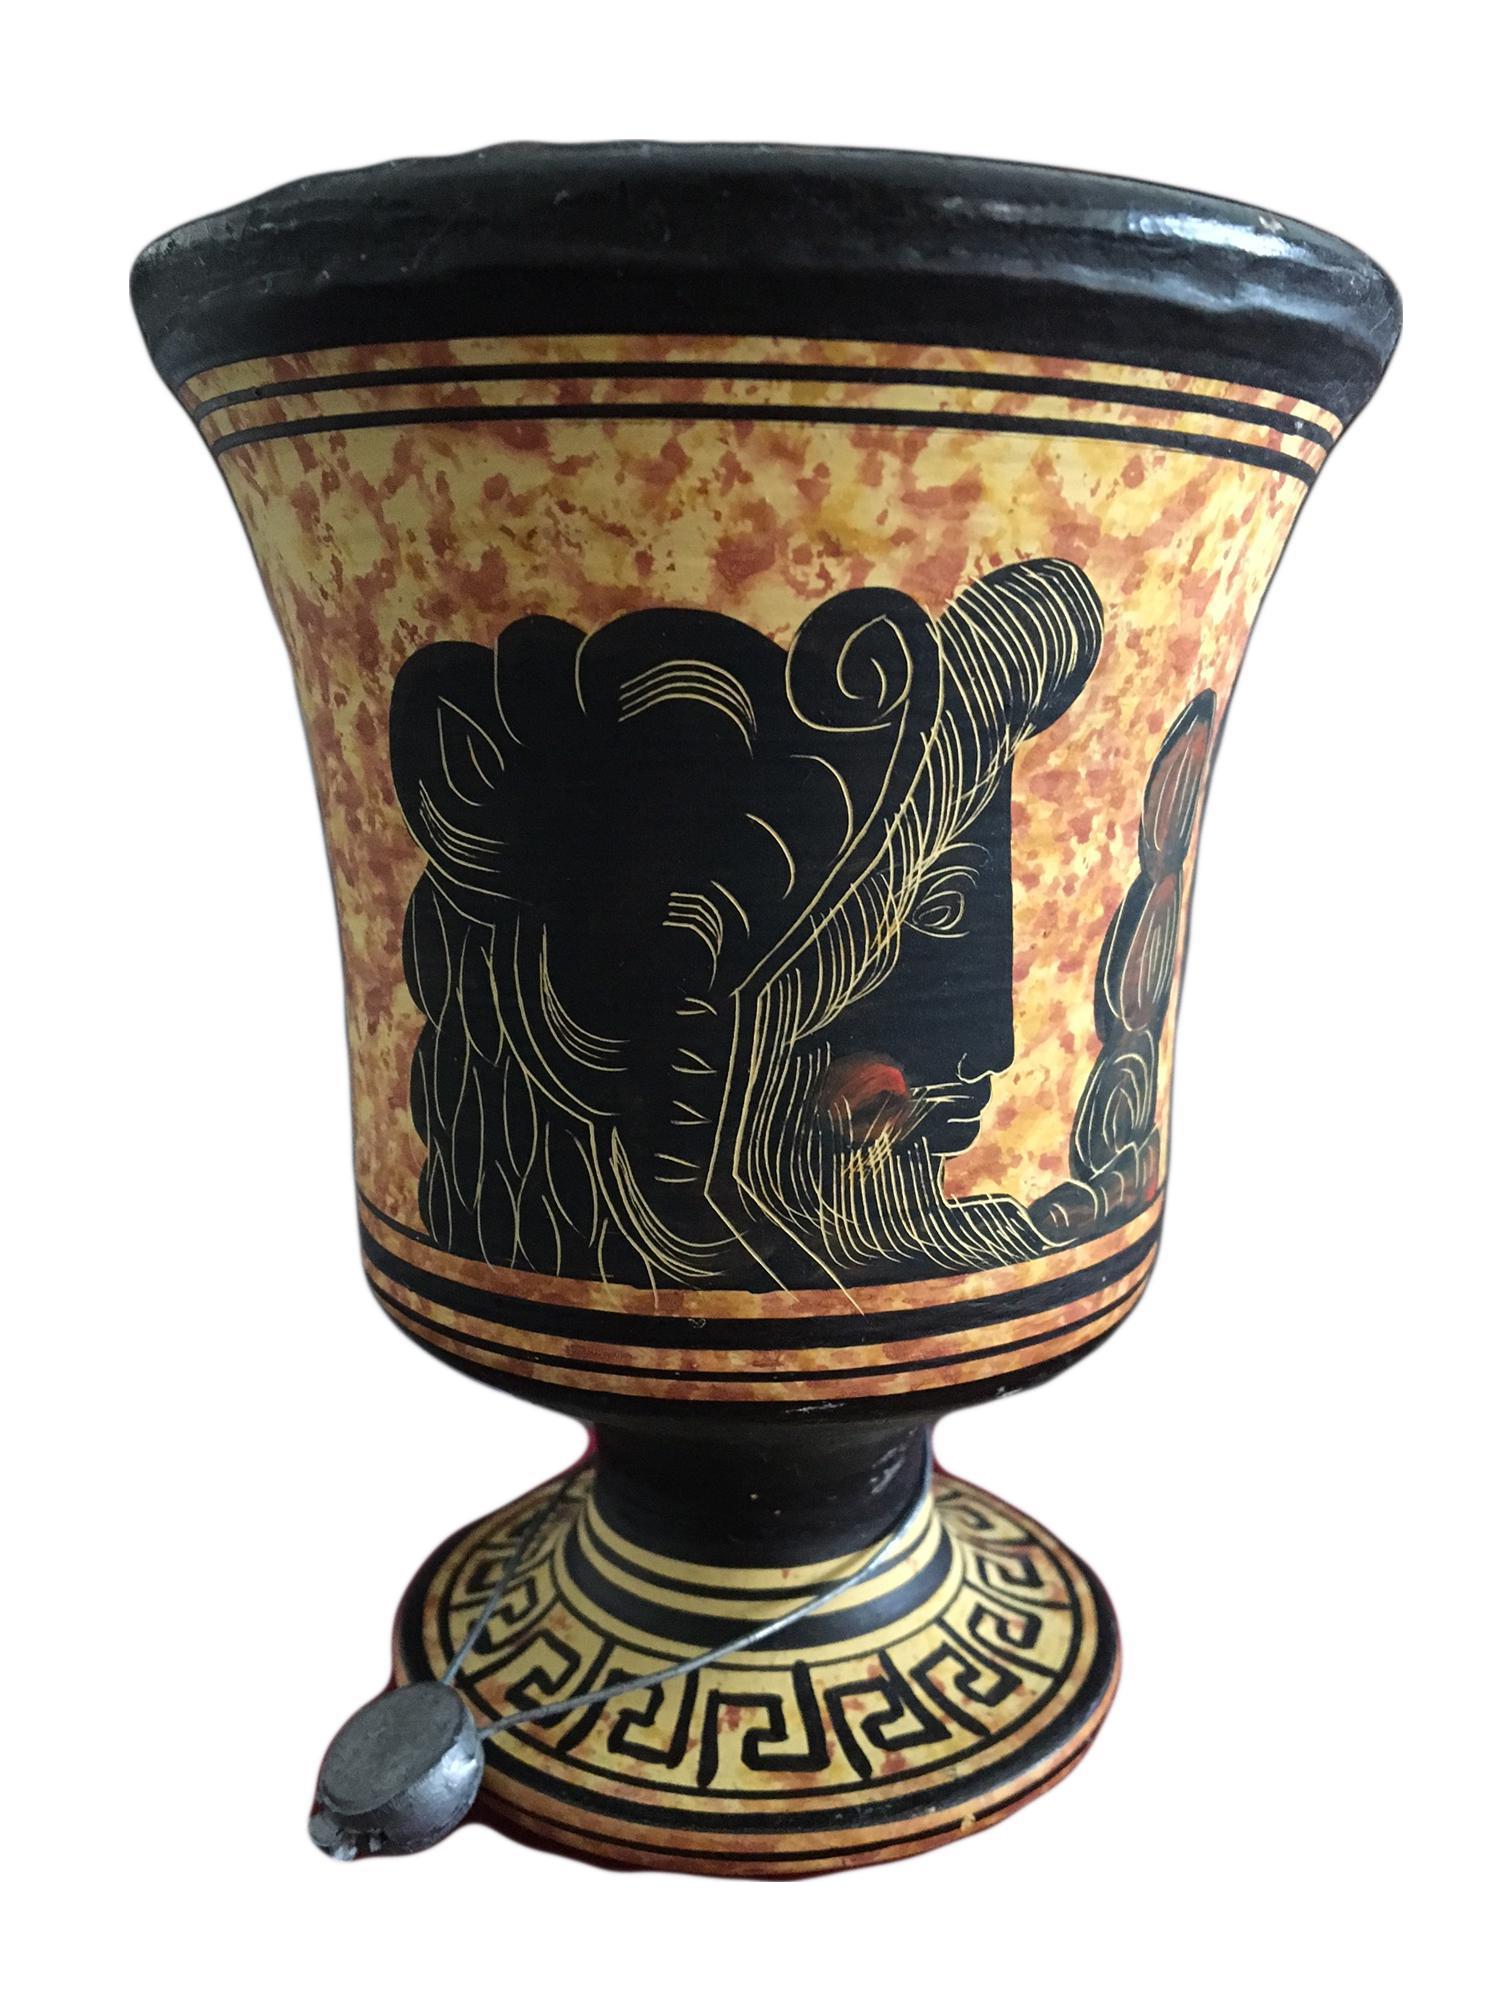 Small Black Amp Yellow Greek Signed Vase Chairish